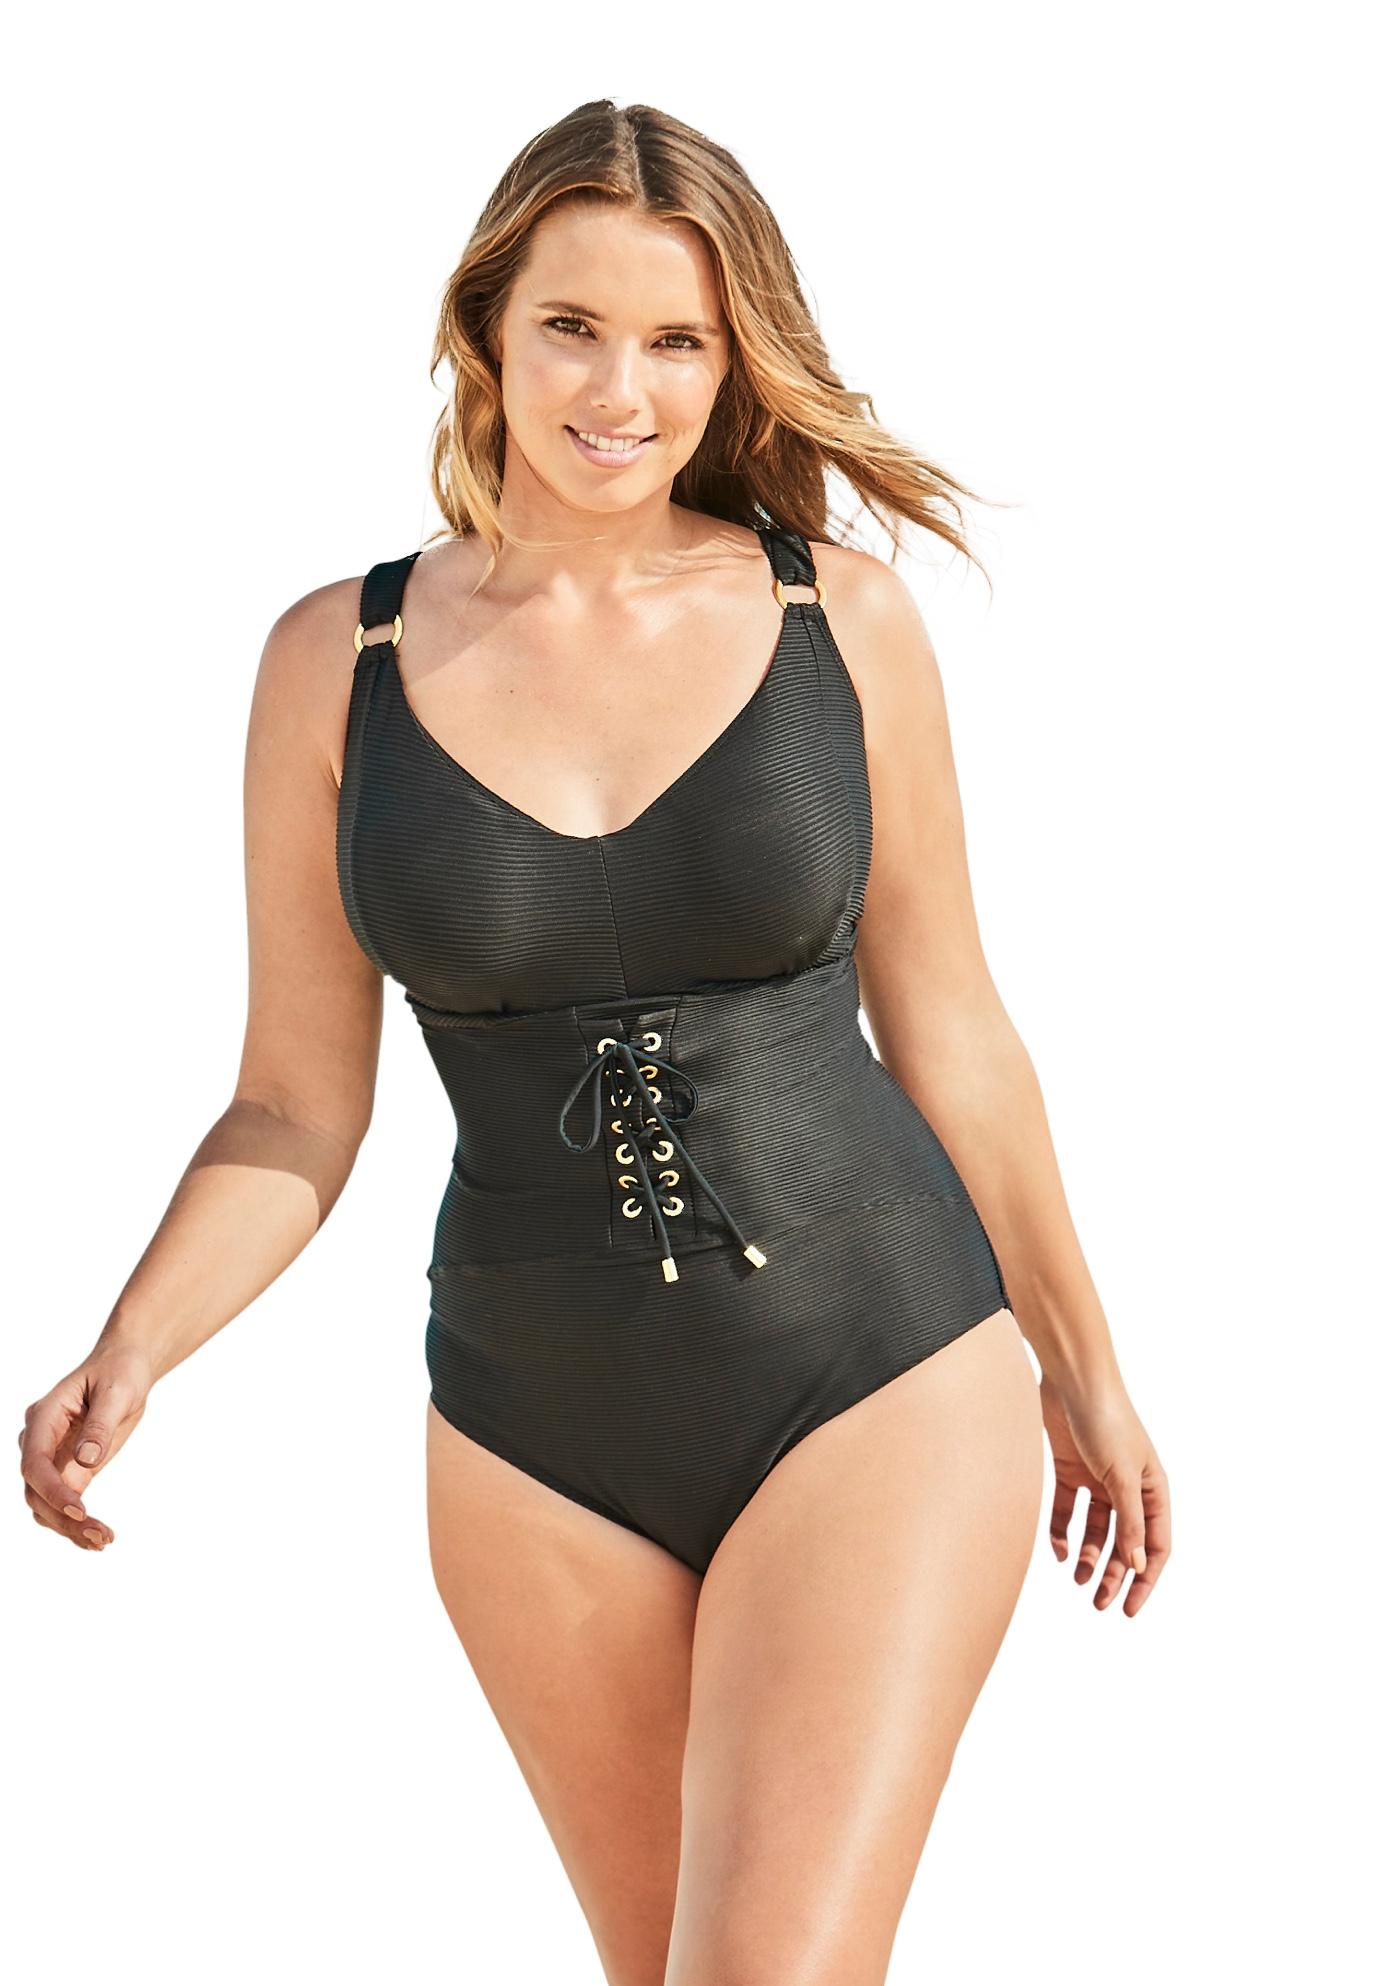 Plus Size Women's Ribbed Underwire One-Piece by Swim 365 in Black